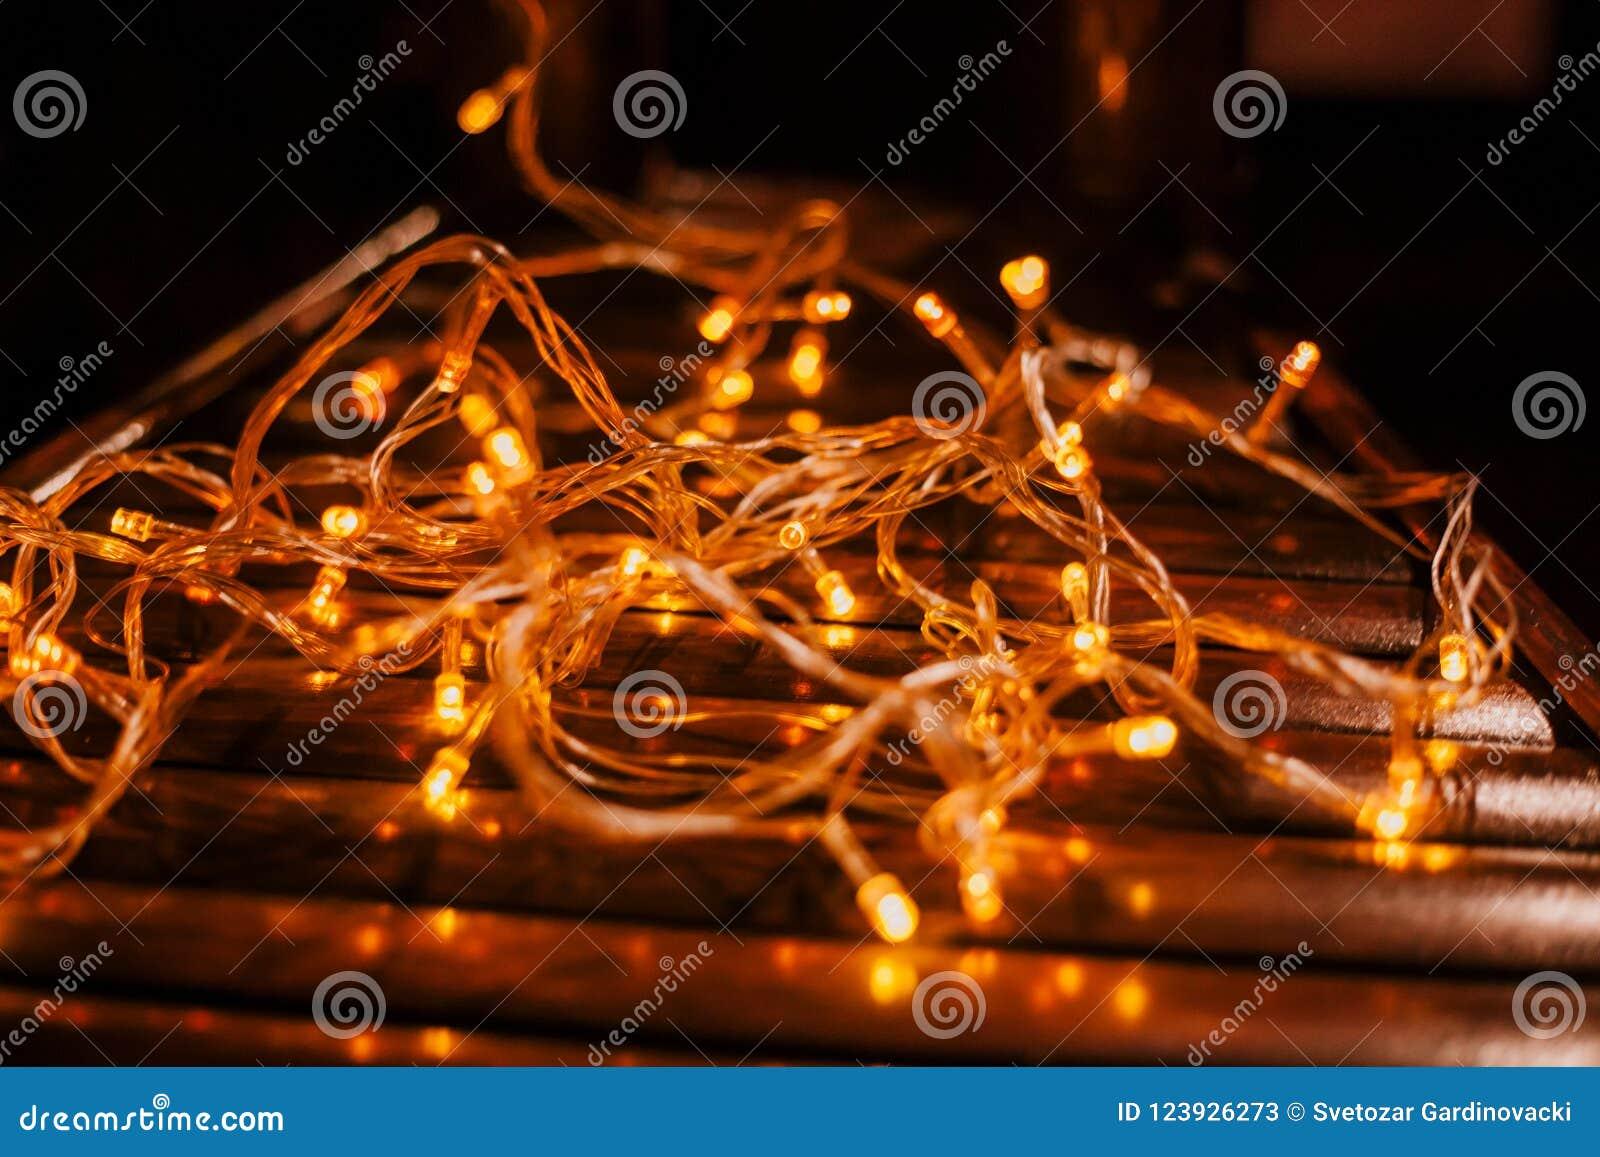 Led lights texture